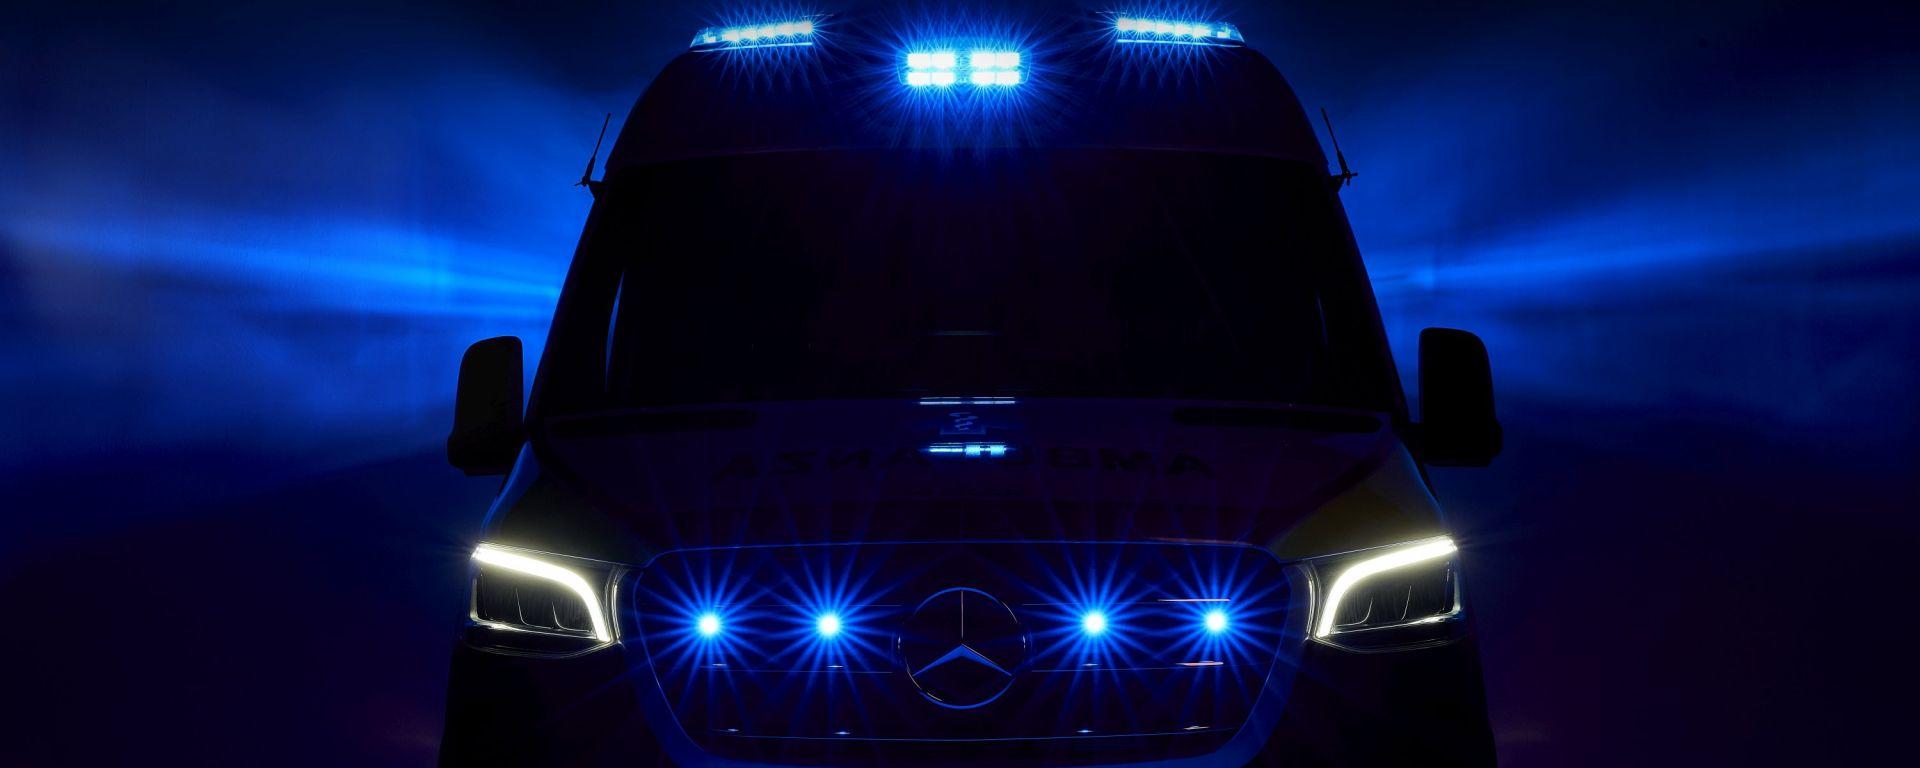 Ambulanza Mercedes Olmedo Sprinter 314 a sirene accese